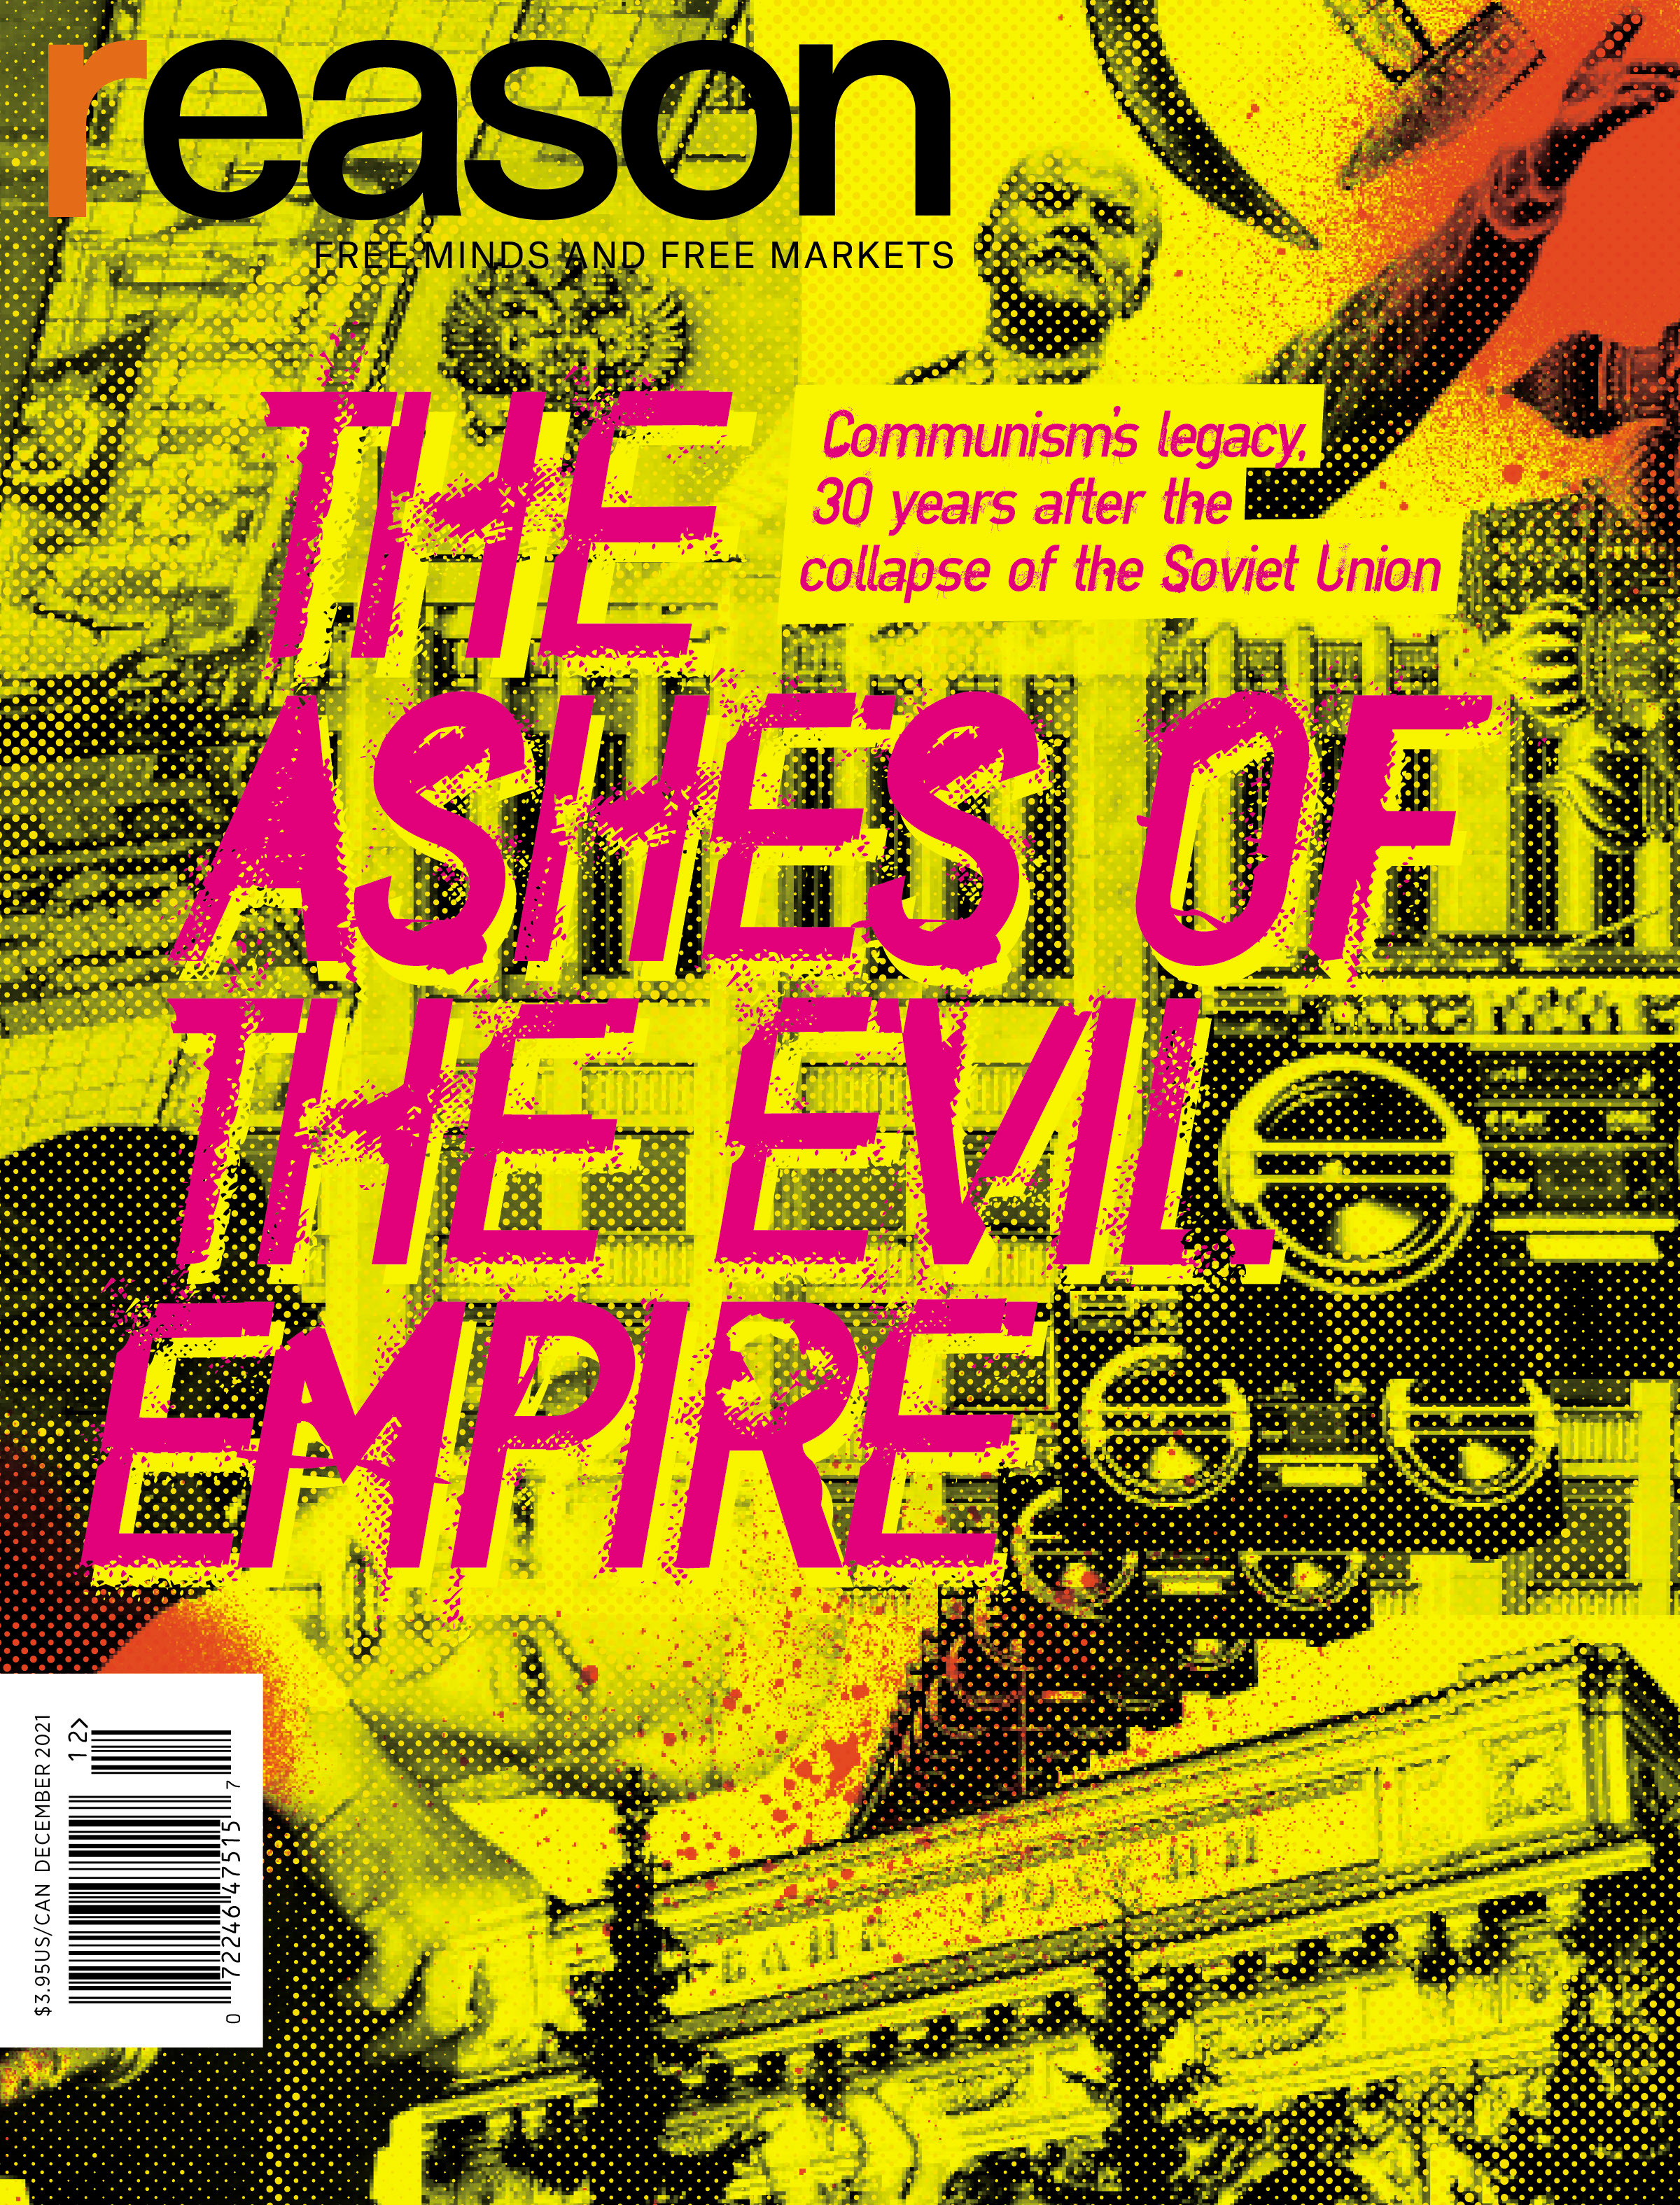 Reason Magazine, December 2021 cover image